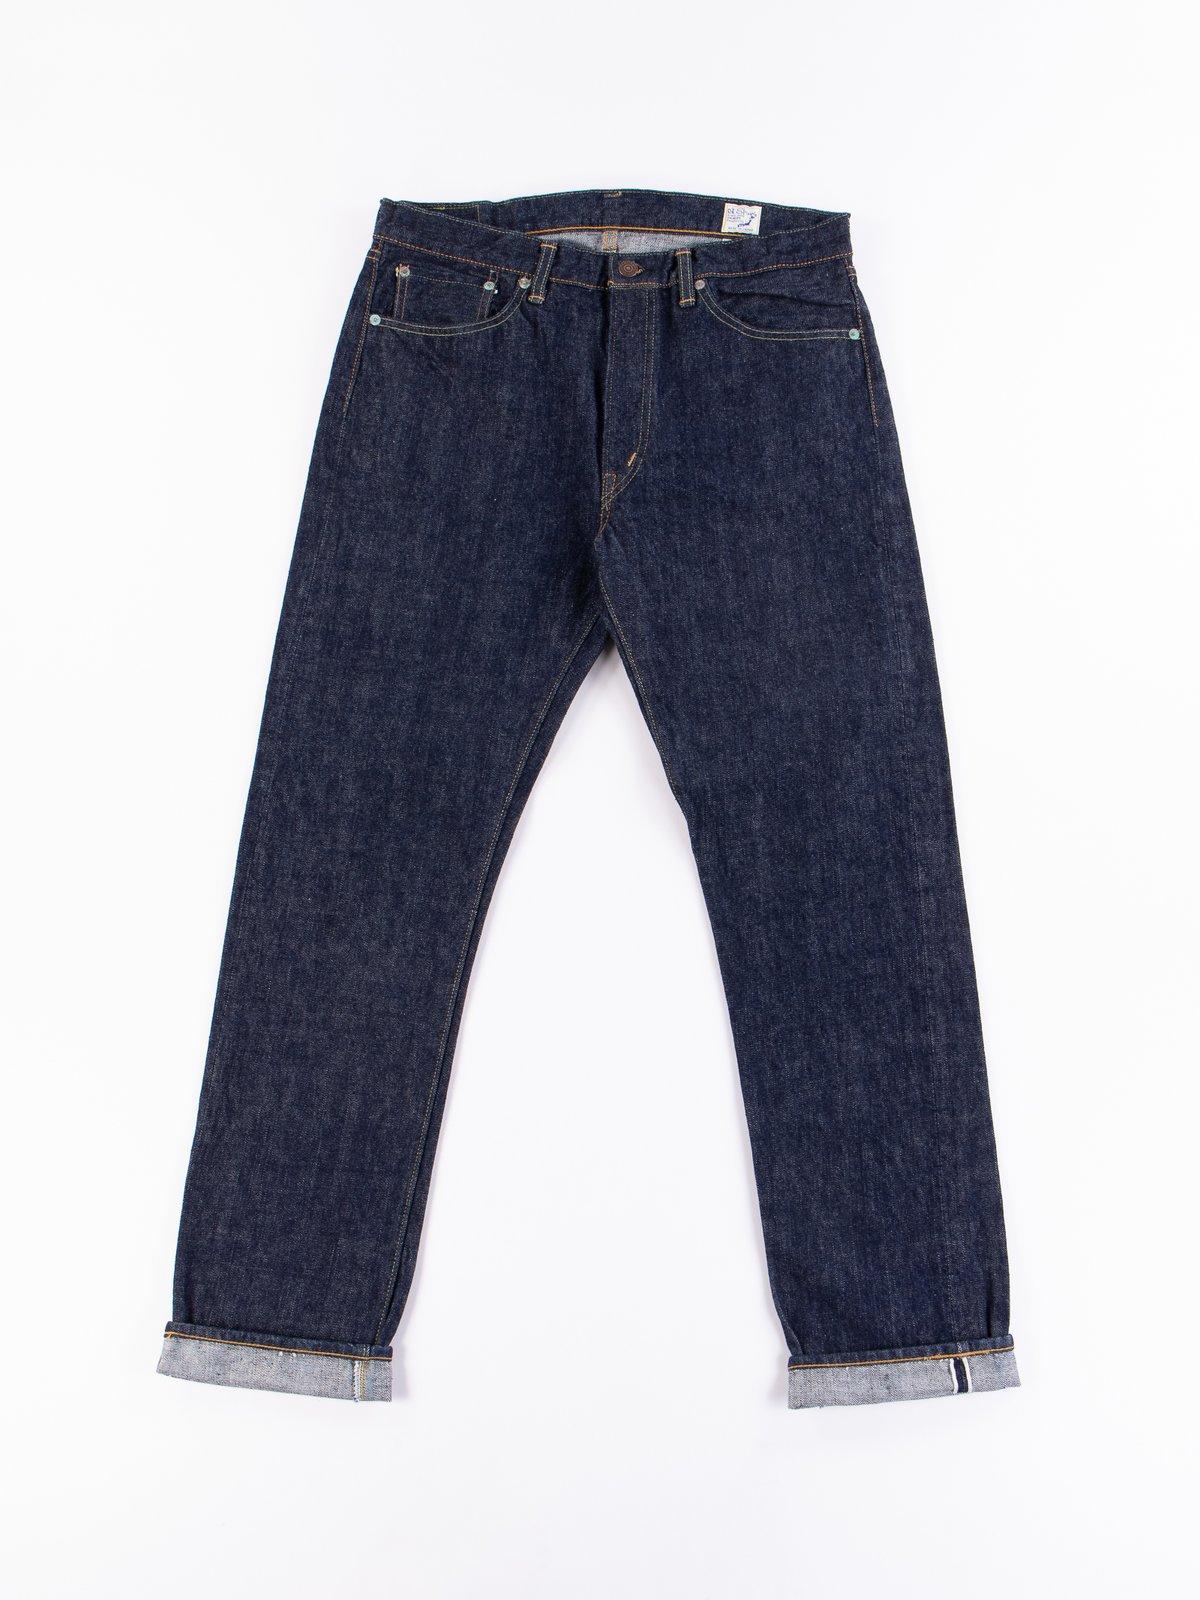 Indigo One Wash 107 Slim Fit Jean - Image 1